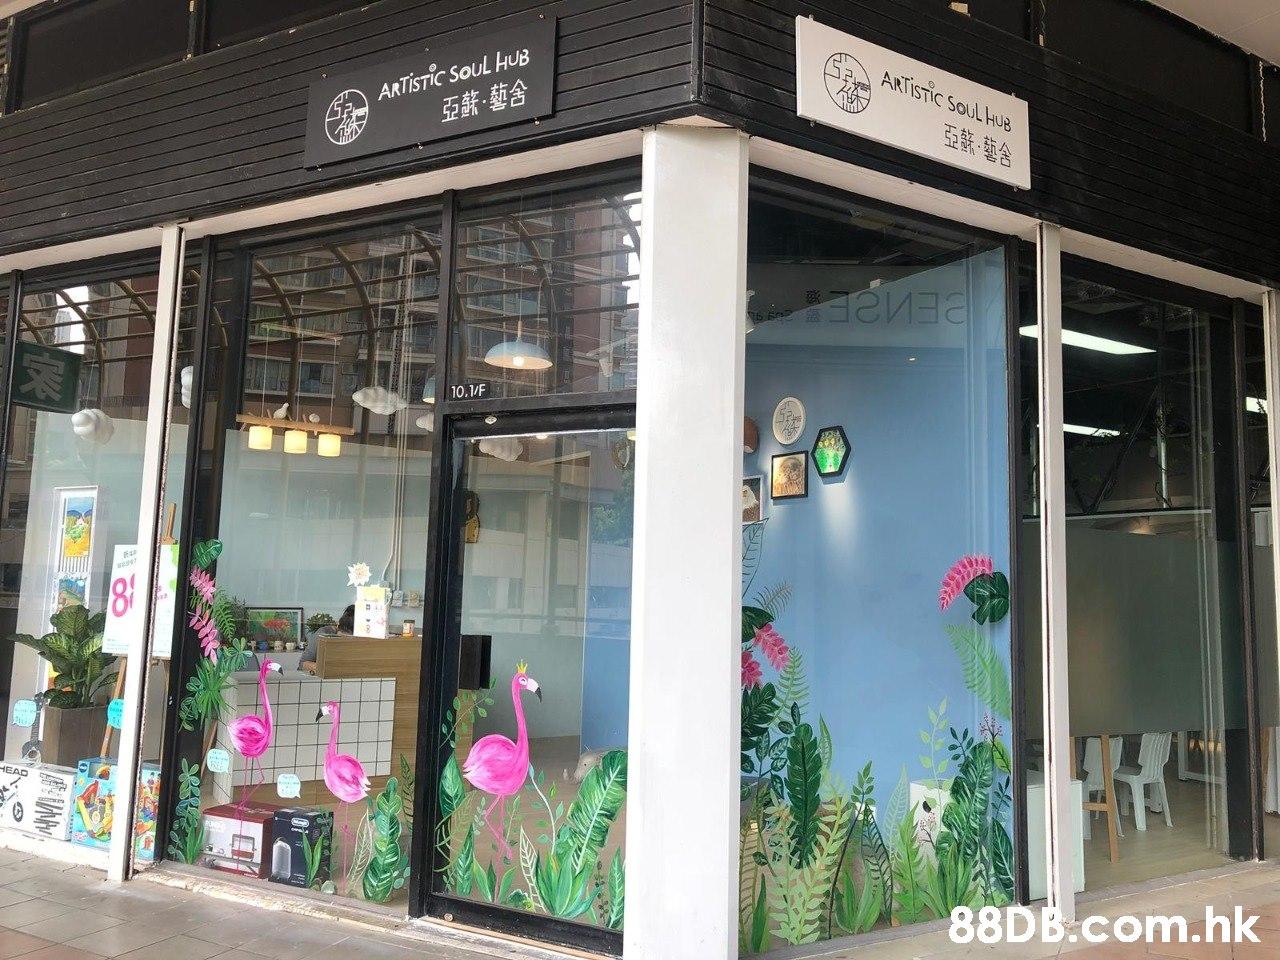 ARTÍSTIC SOUL HUB 亞葉-藝舍 ANTISTIC SOUL HUB еиза 10.1/F 81 HEAD .hk  Building,Facade,Floristry,Display window,Glass